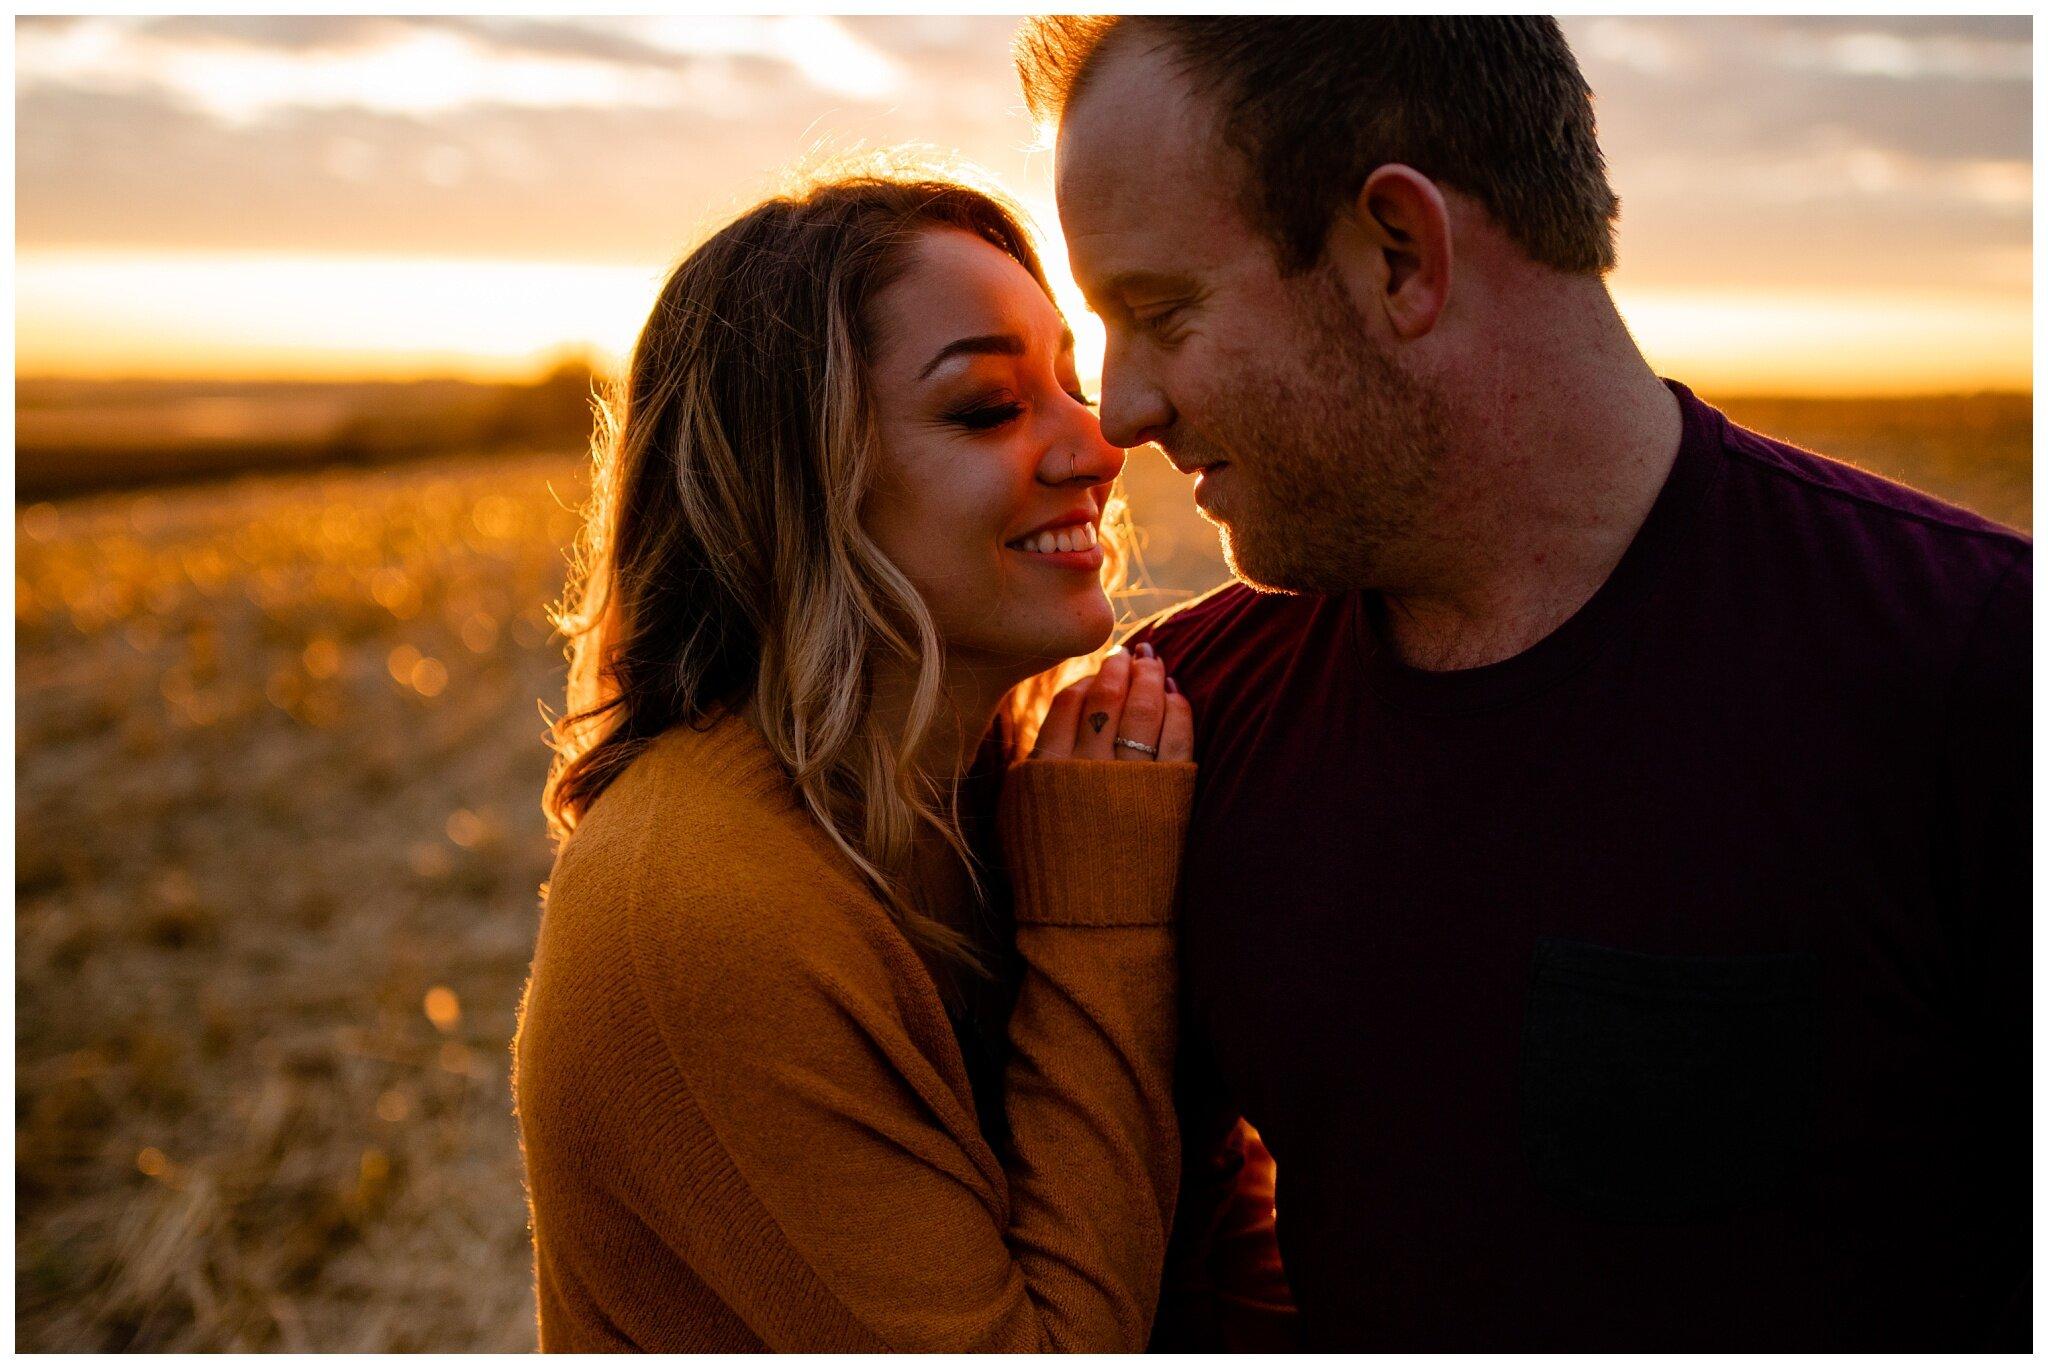 Edmonton Engagement Photographer Romantic Couples Photos Local YEG Strathcona County_0020.jpg